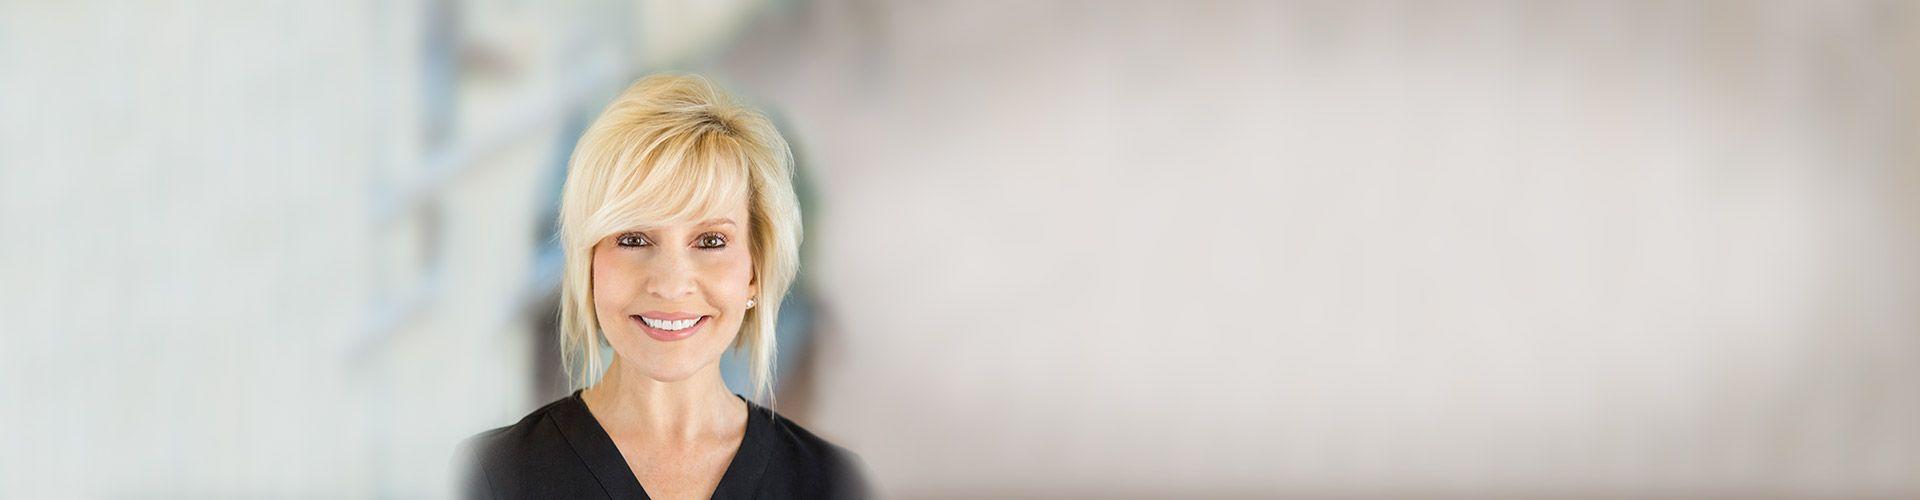 Kathryn Kettenhofen - Patient Coordinator